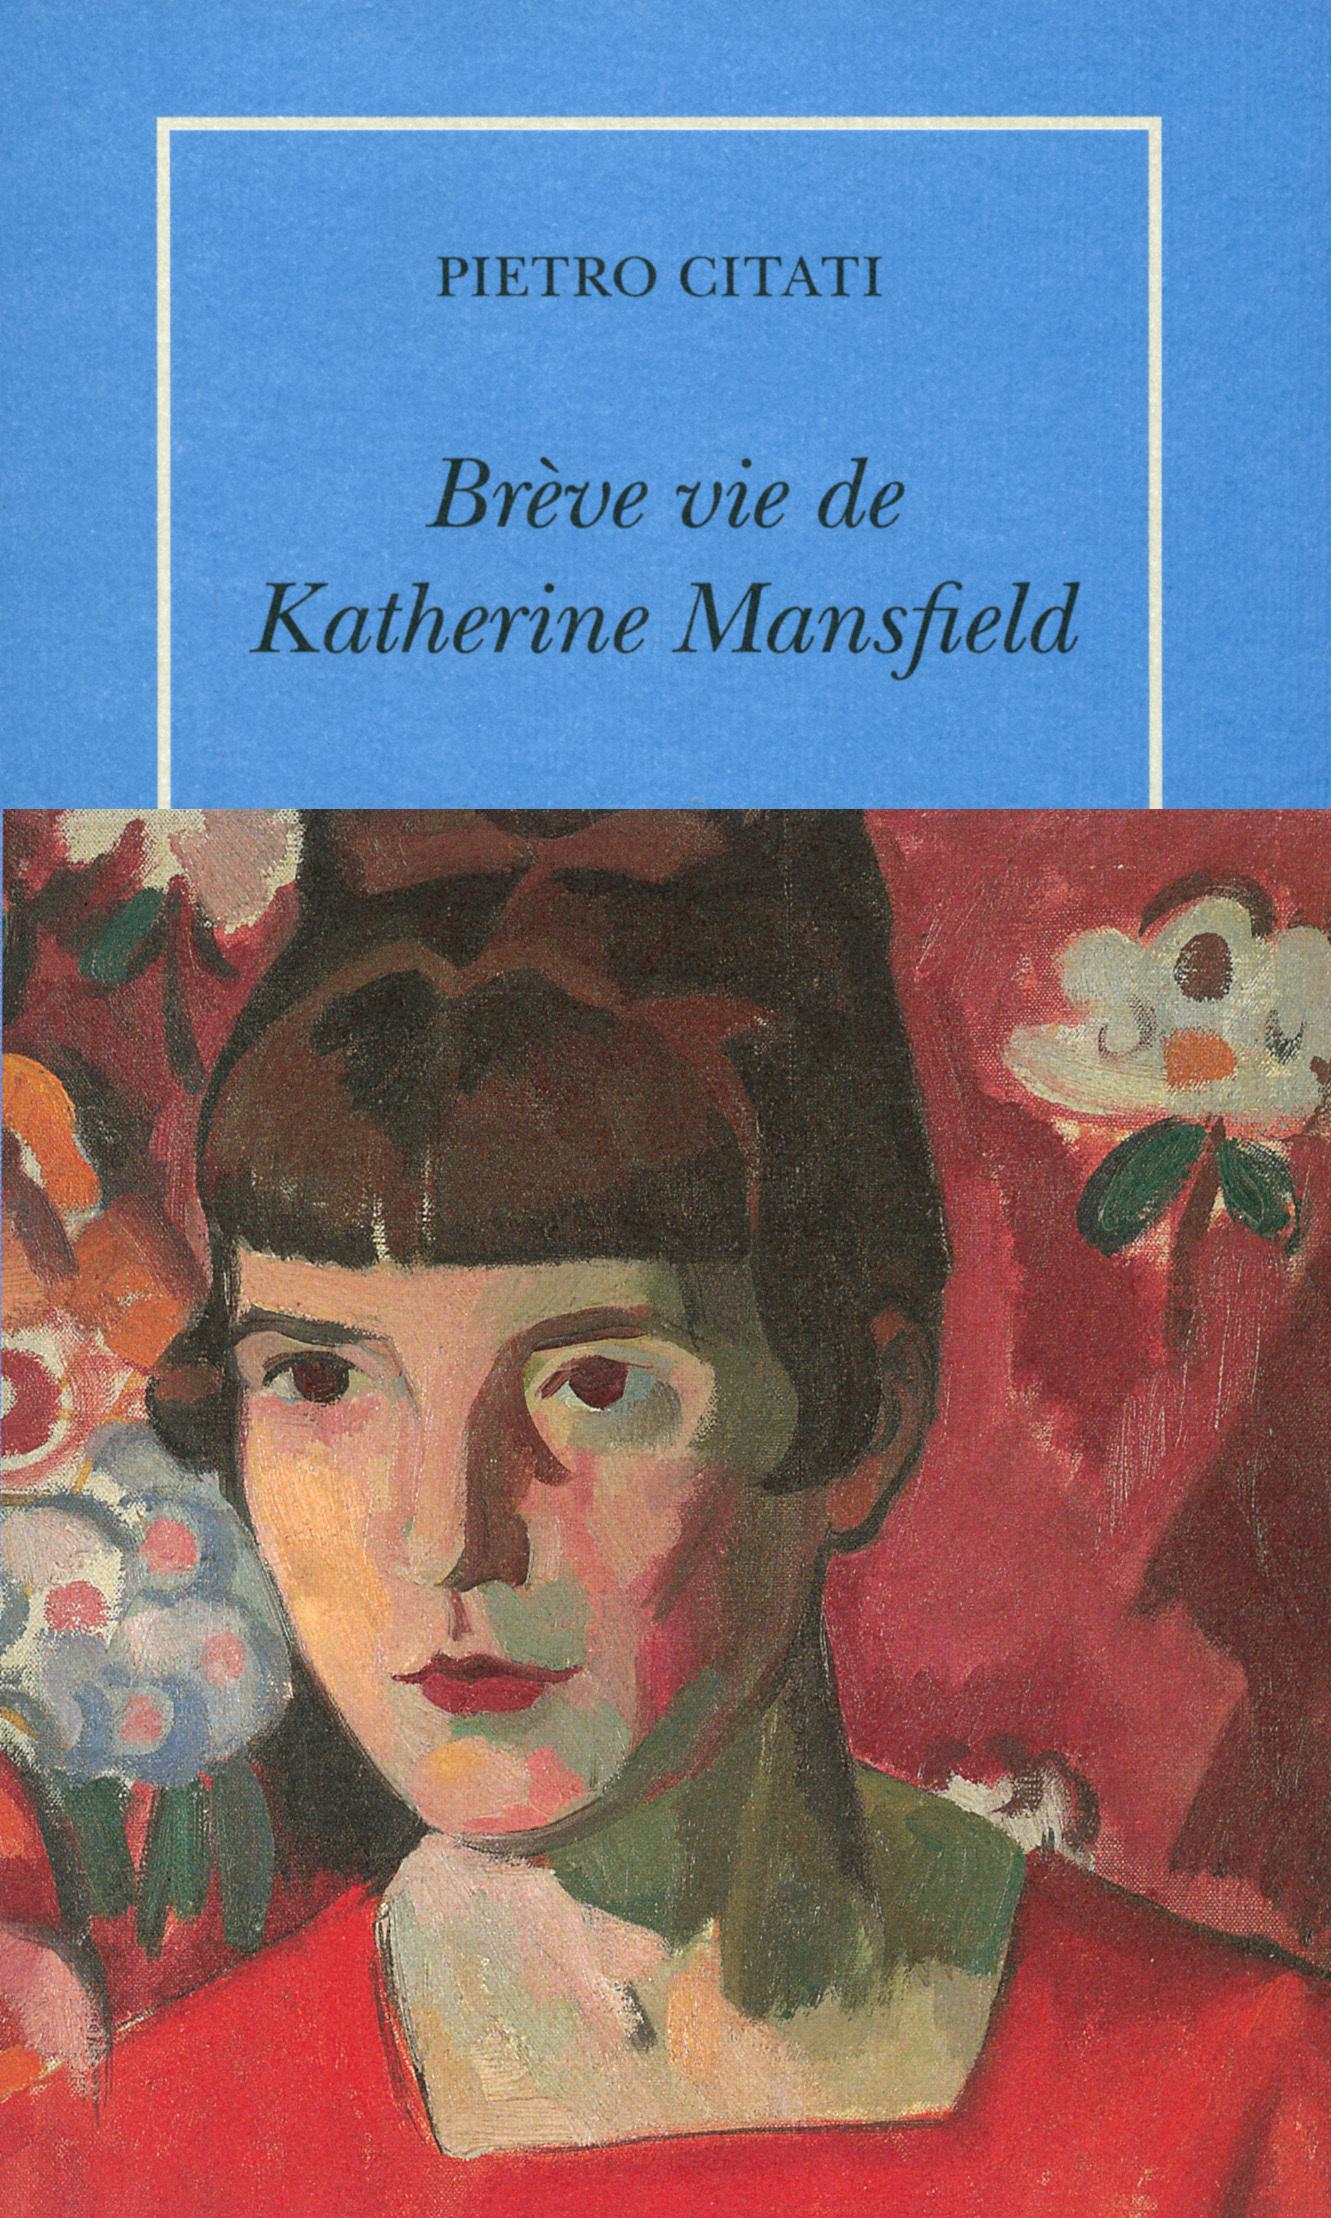 BREVE VIE DE KATHERINE MANSFIELD